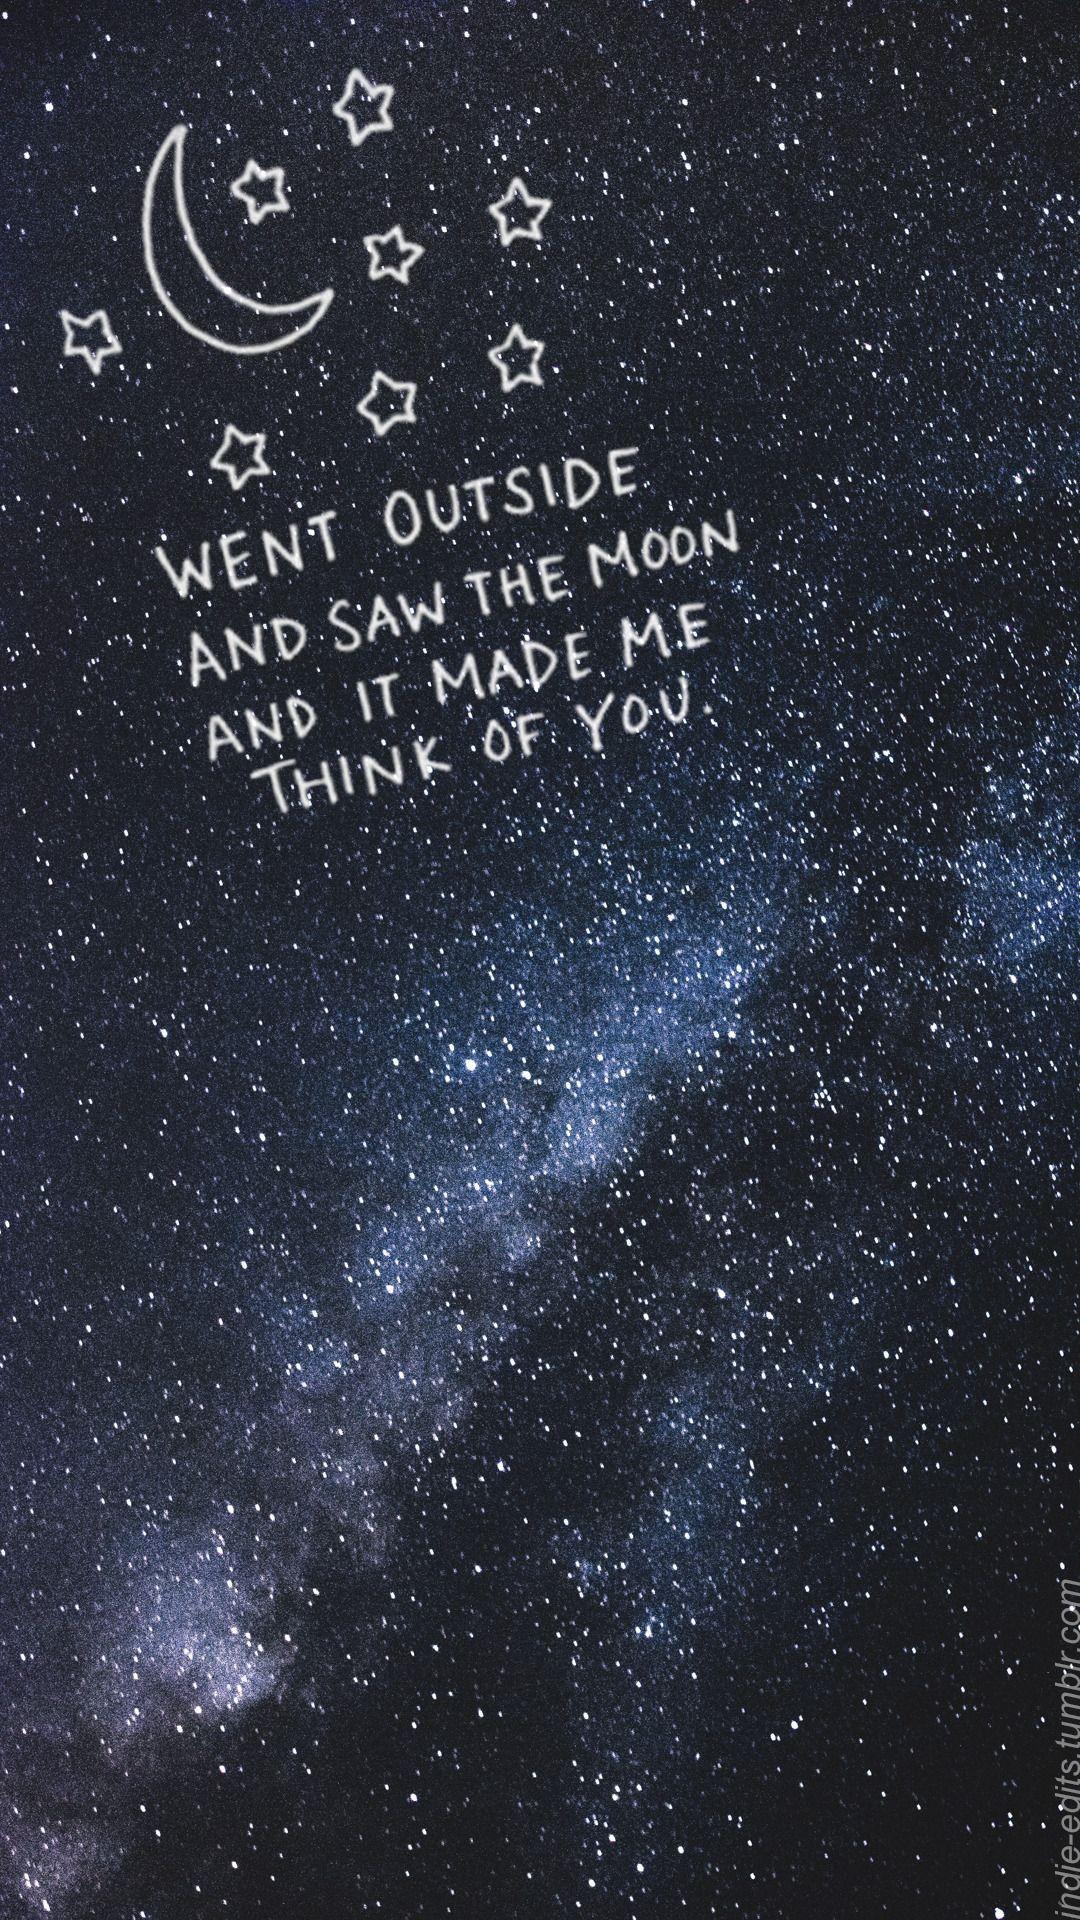 Awesome Grunge Wallpaper Tumblr Galaxy Wallpaper Quotes Wallpaper Quotes Pretty Quotes